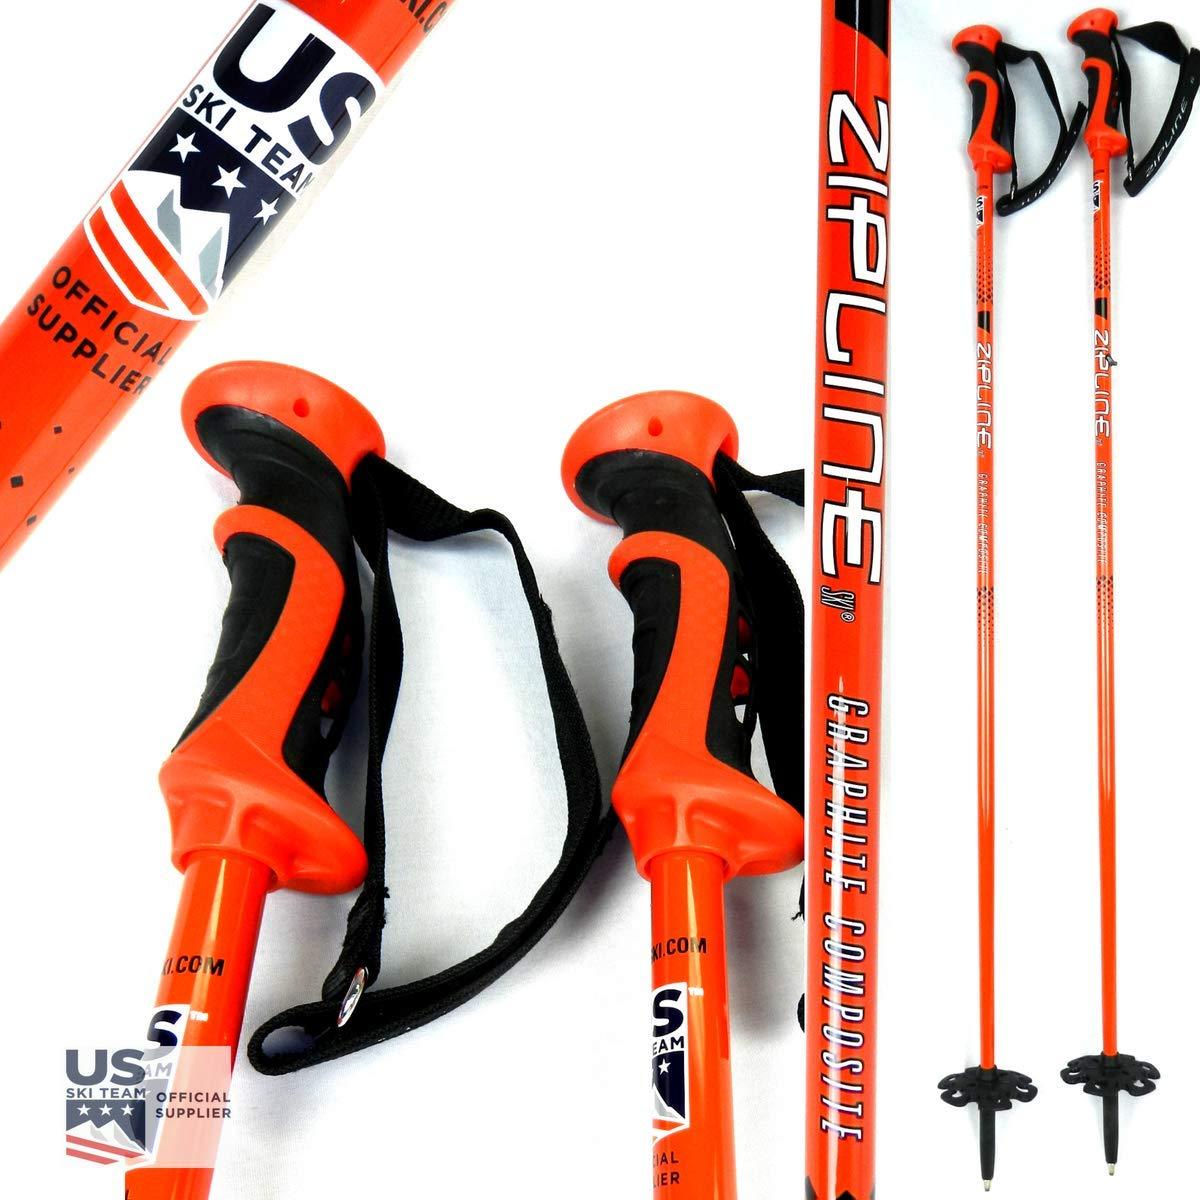 Tropical Blue, 52 in.//132 cm Ski Team Official Ski Pole Zipline Ski Poles Carbon Composite Graphite Blurr 16.0 U.S Downhill//Mens//Womens//Kids//Junior//Freestyle//Racing